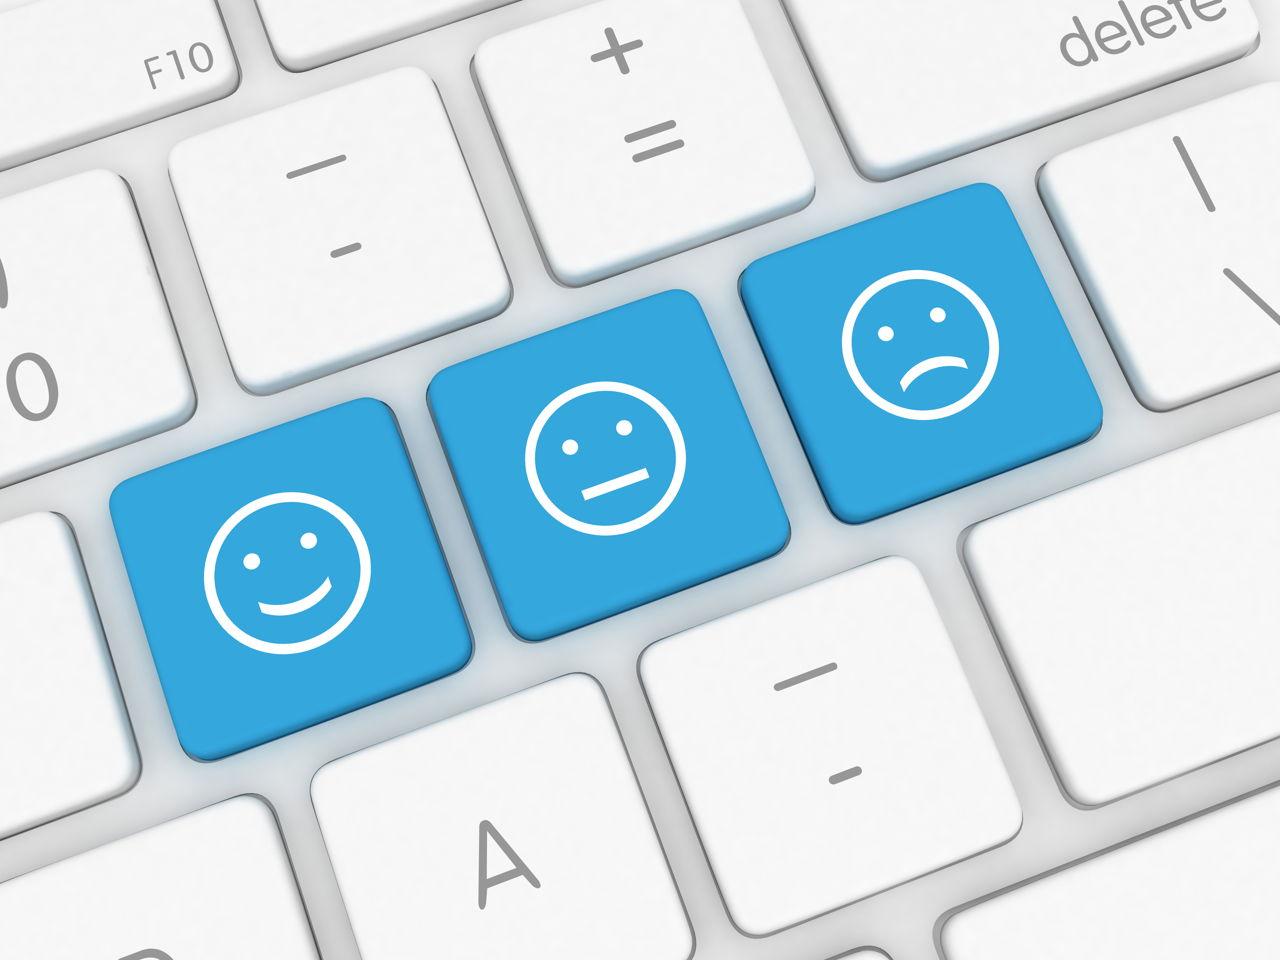 Facebook abbreviations and symbols share this smiley face symbols buycottarizona Choice Image